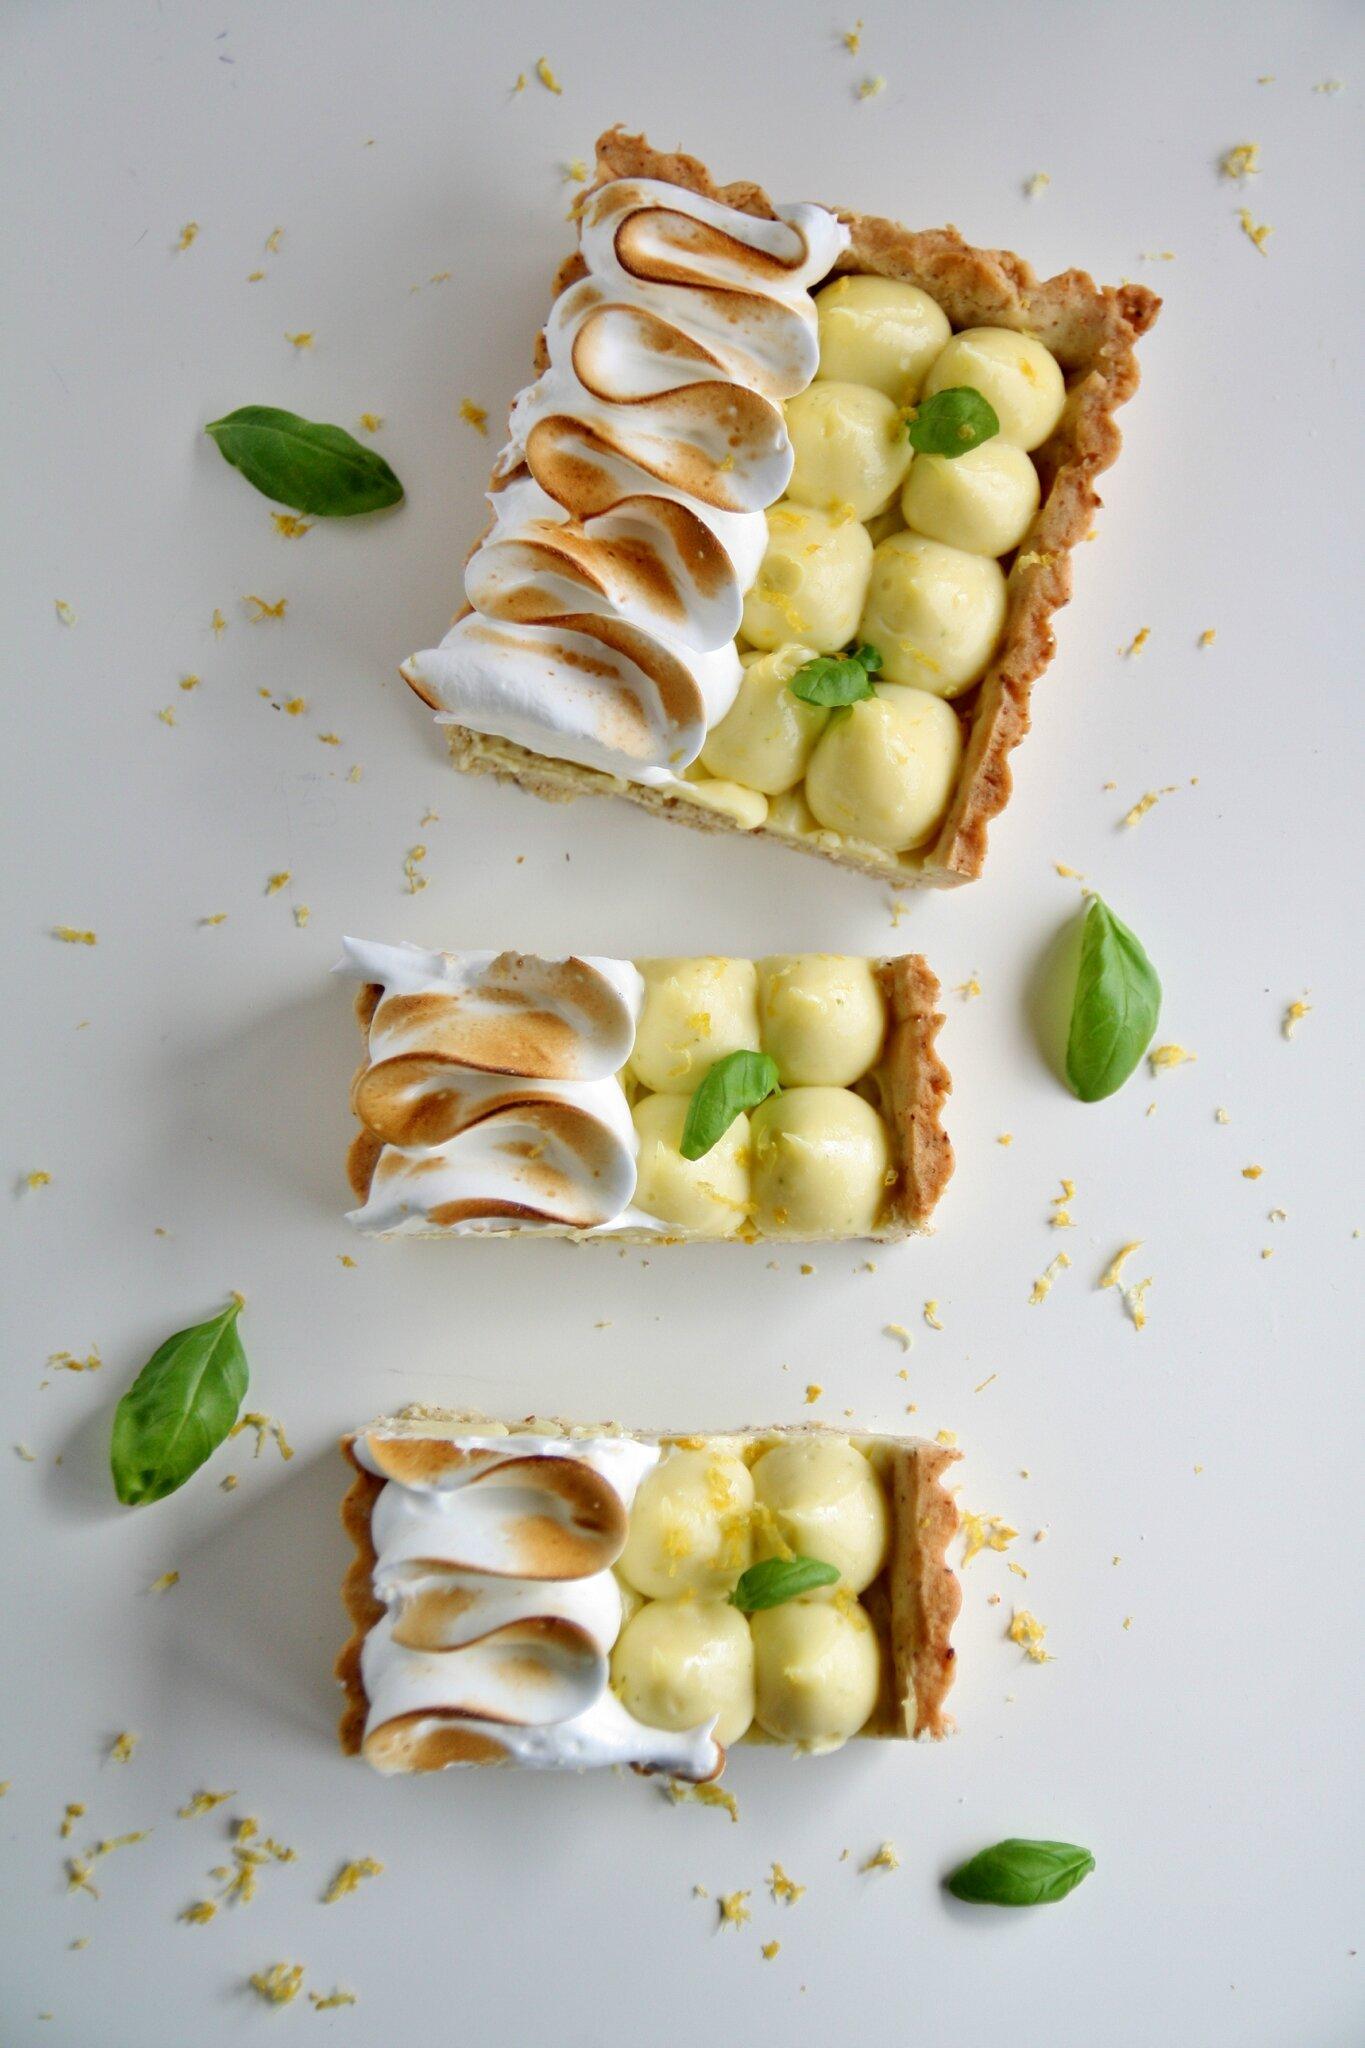 Tarte au citron meringu e that 39 s amore - Recette tarte citron meringuee ...